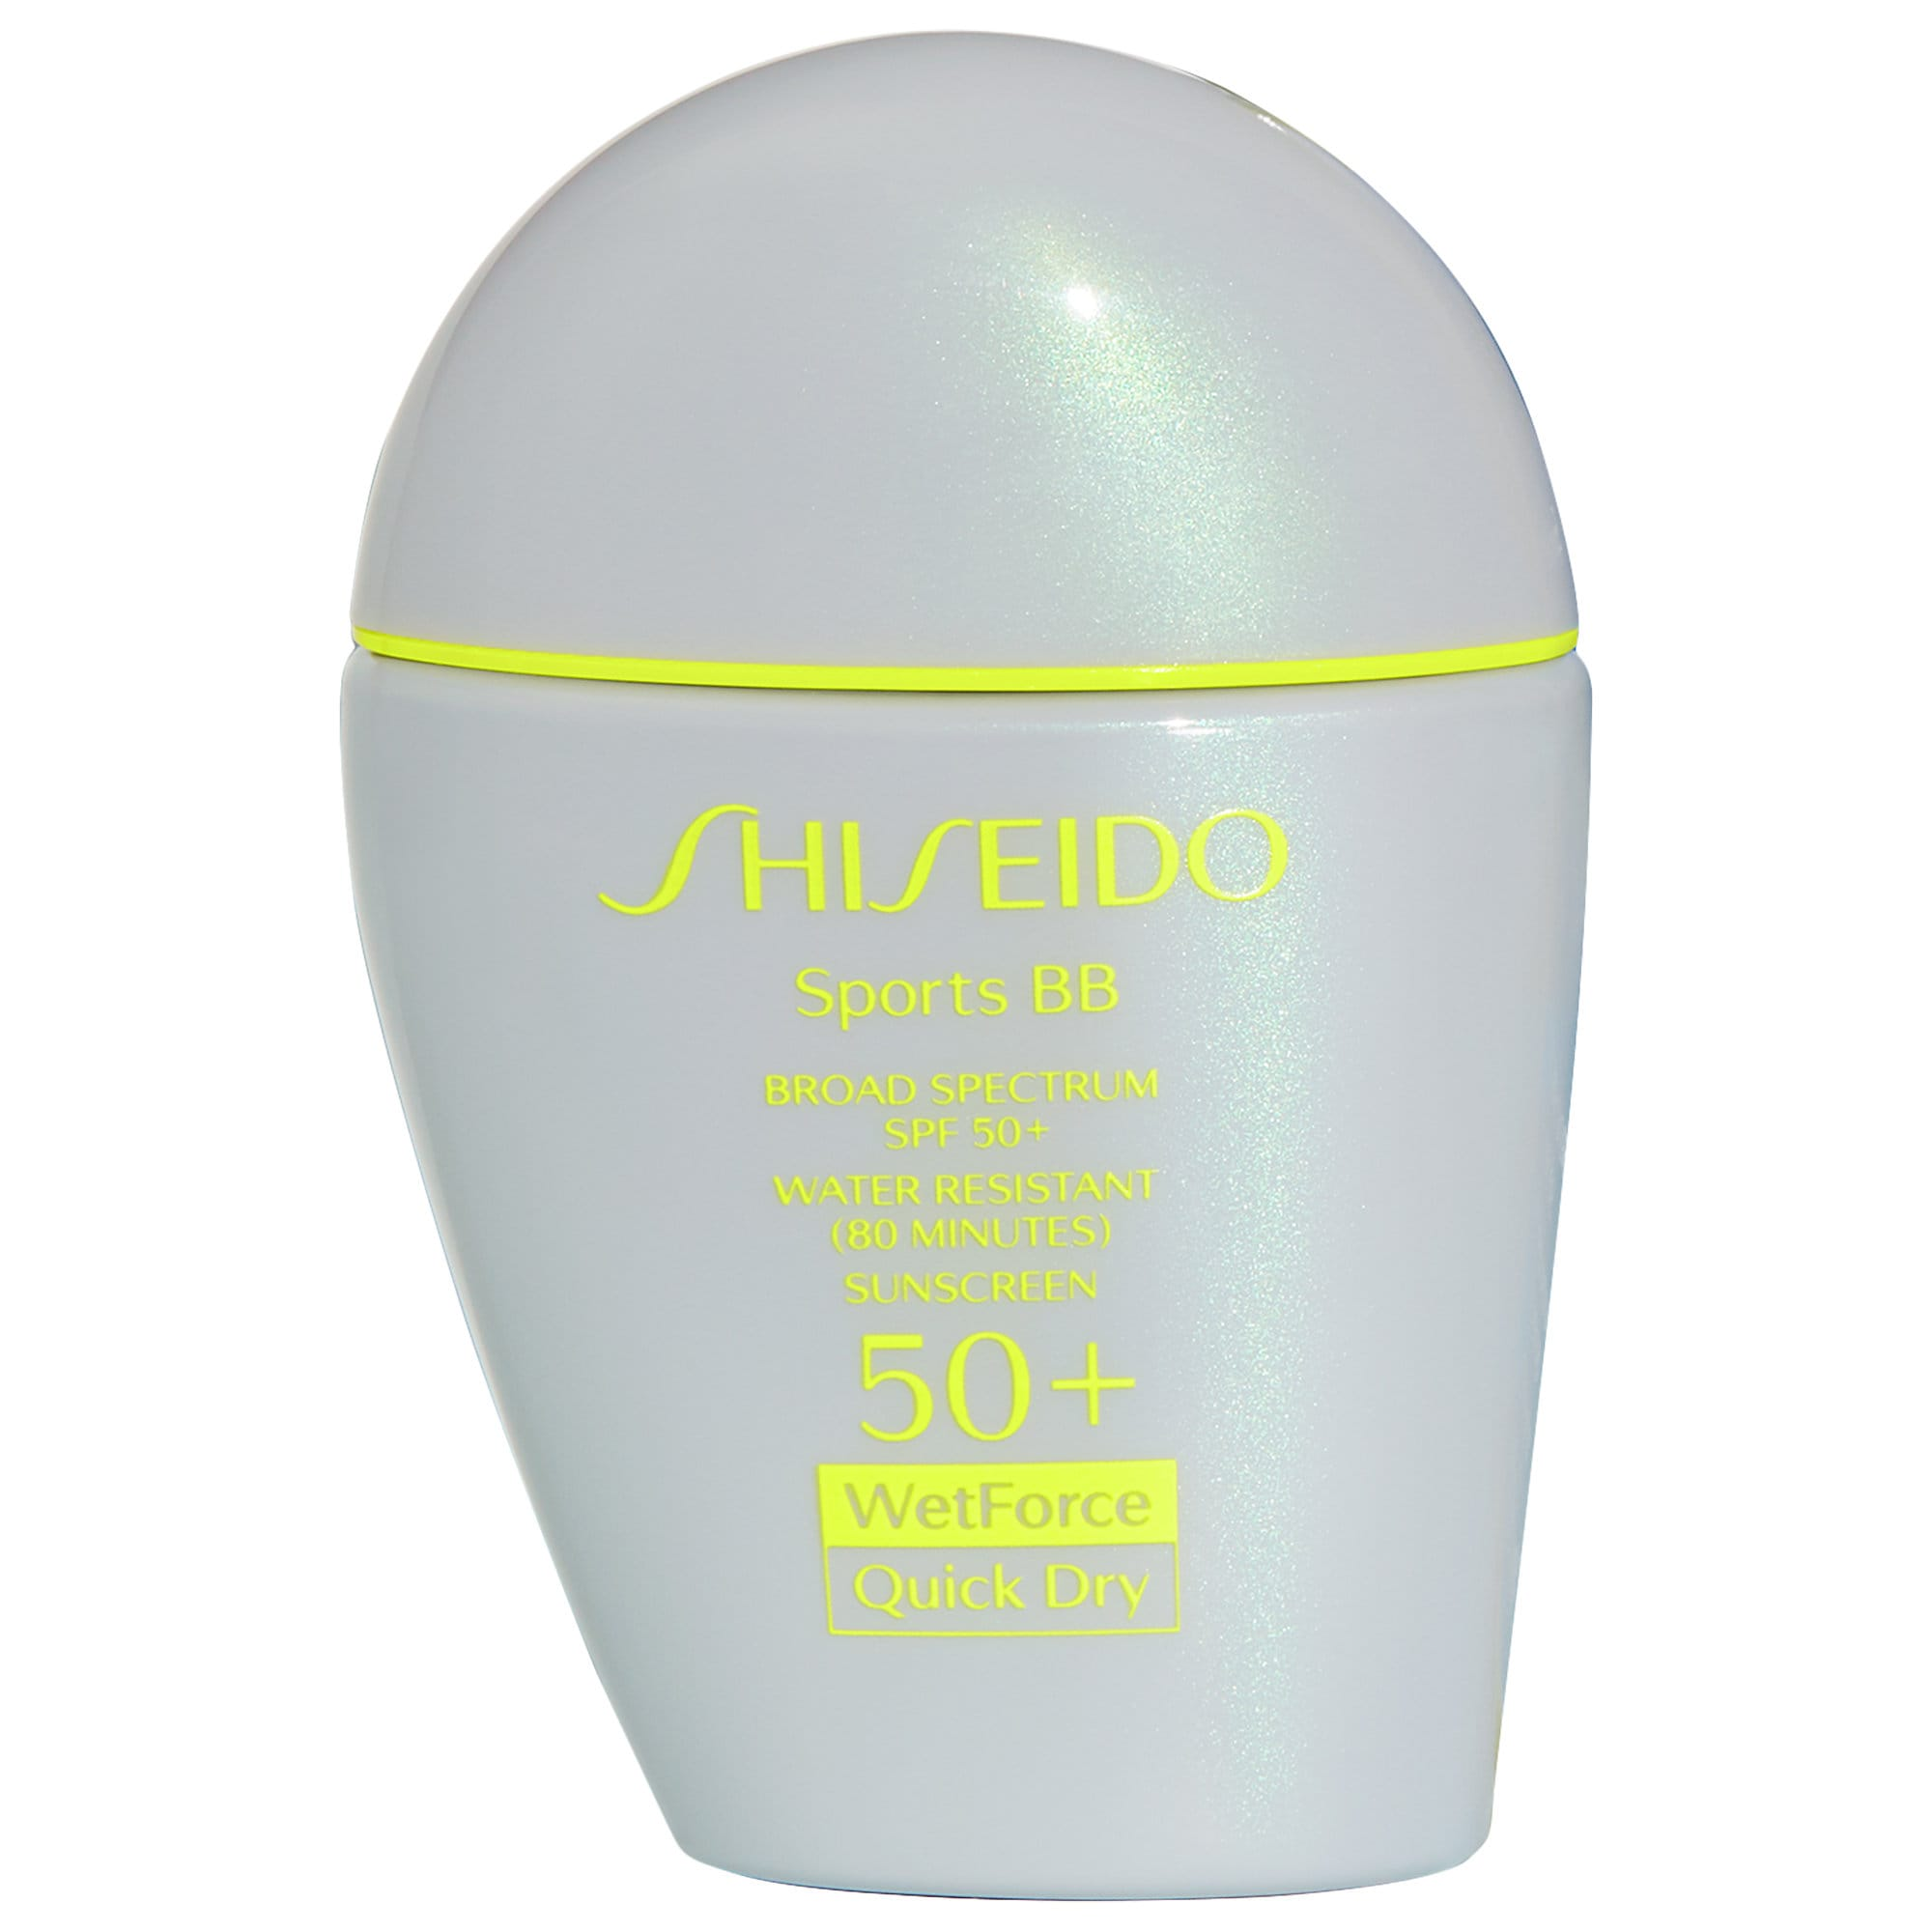 Shiseido - Sports BB SPF 50+